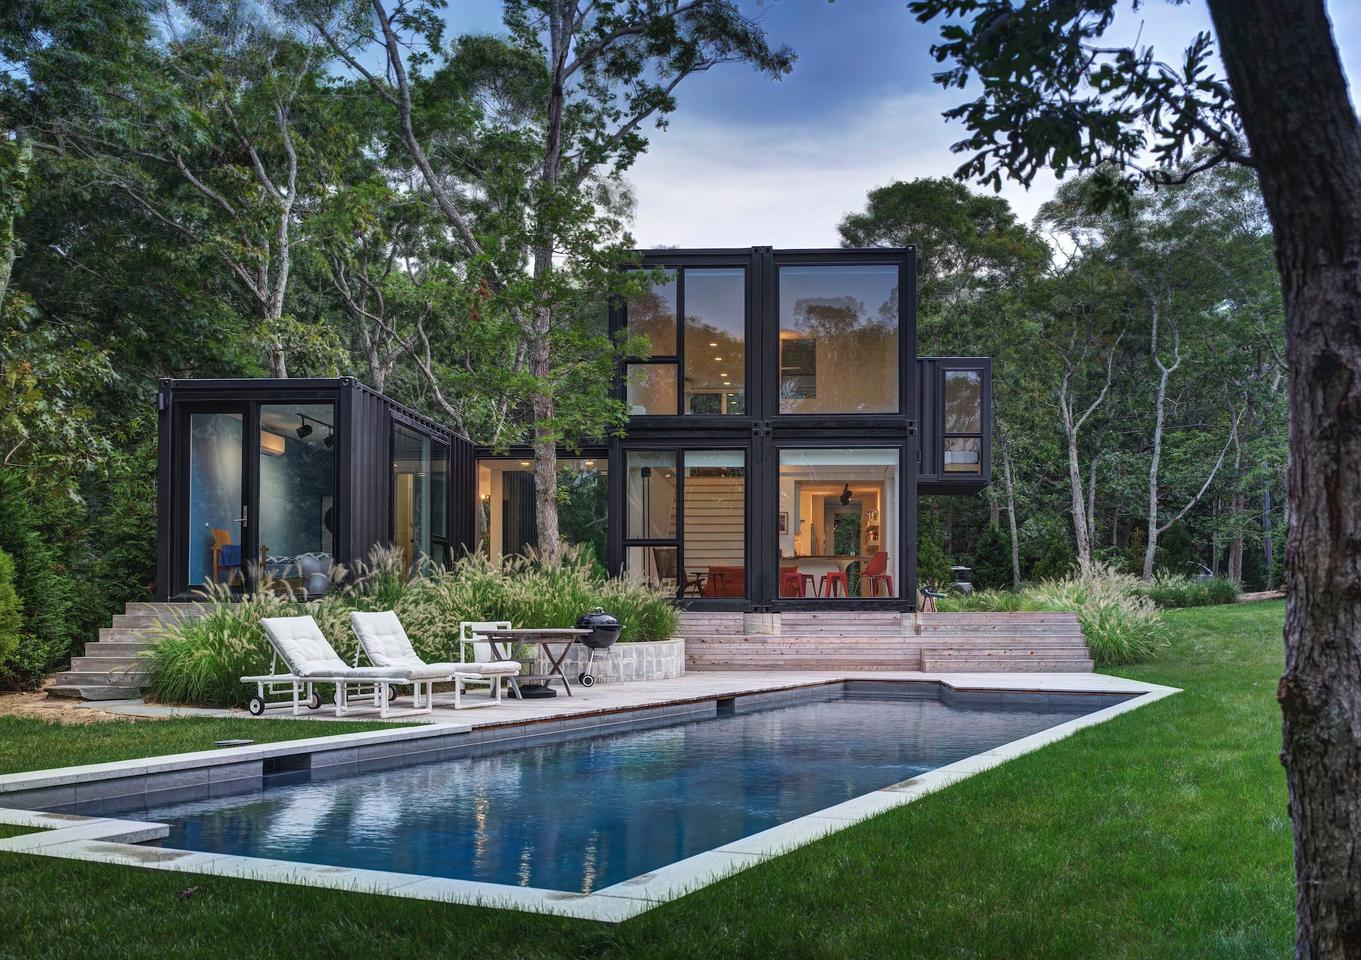 Amagansett Modular includes a pool in the garden